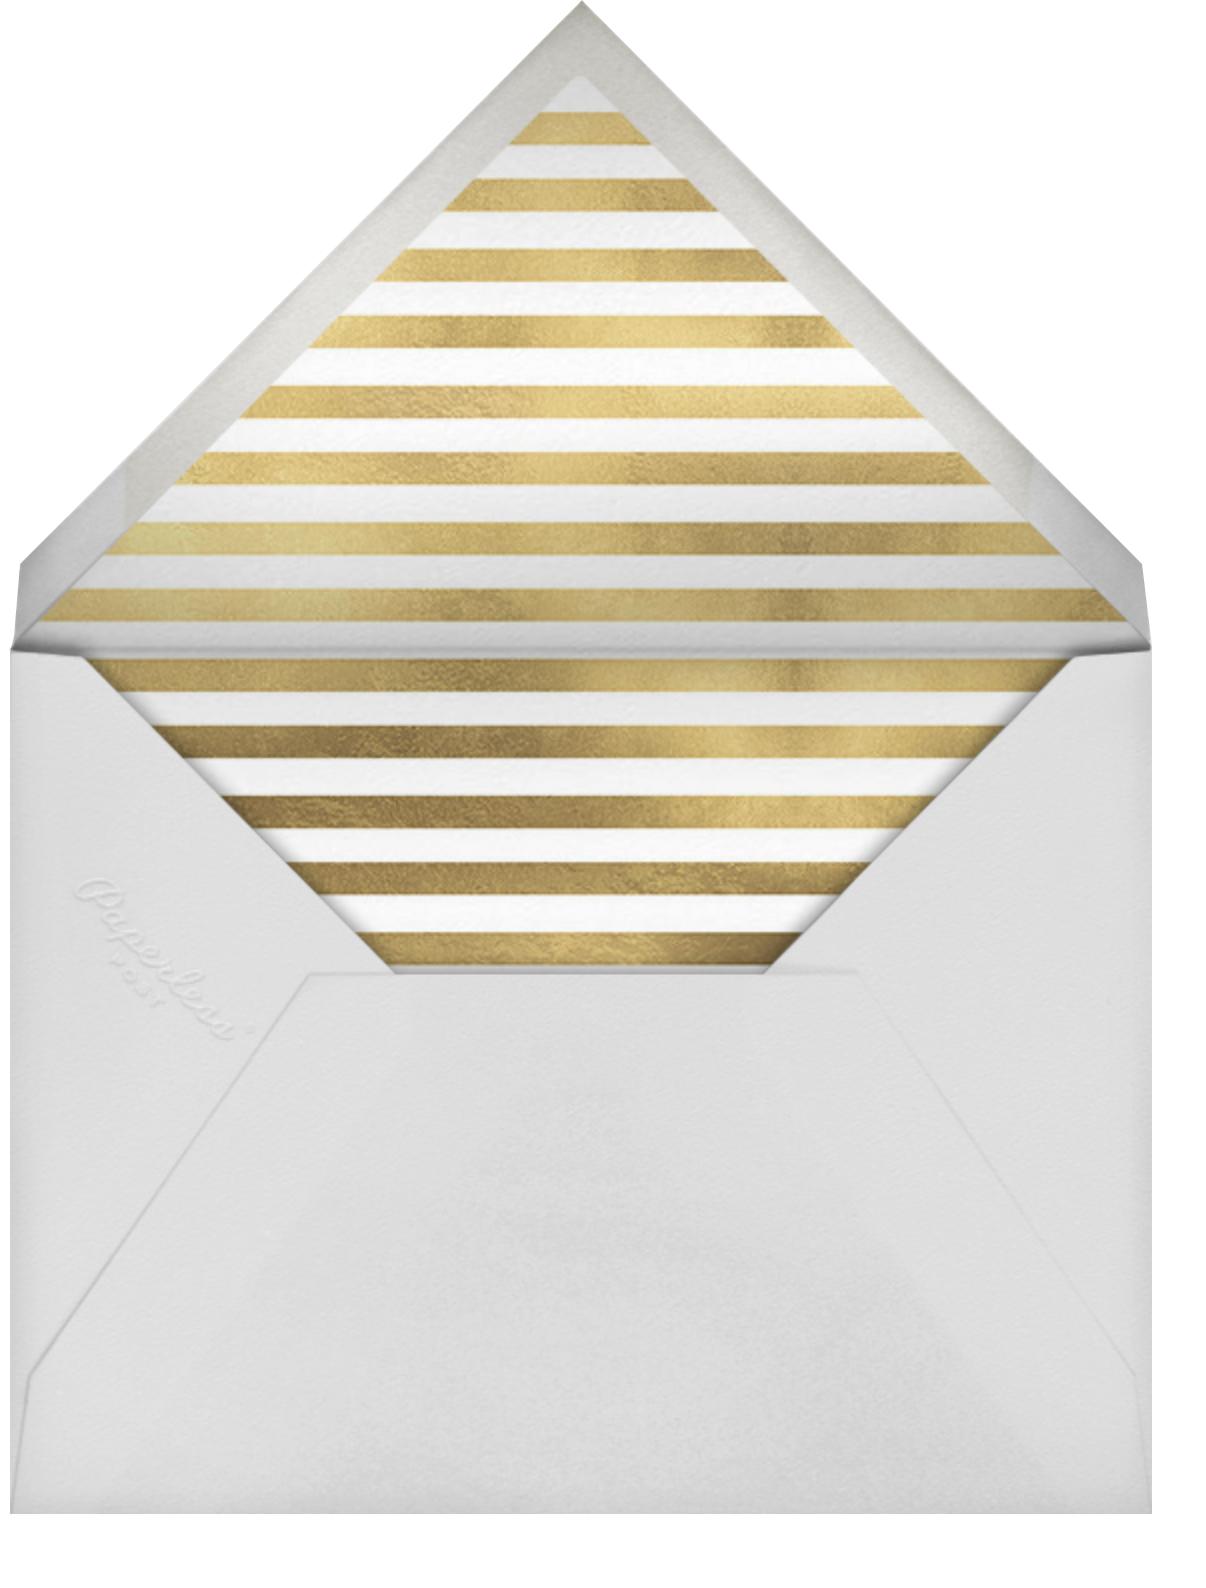 Navy (Tall) - Paperless Post - Graduation - envelope back